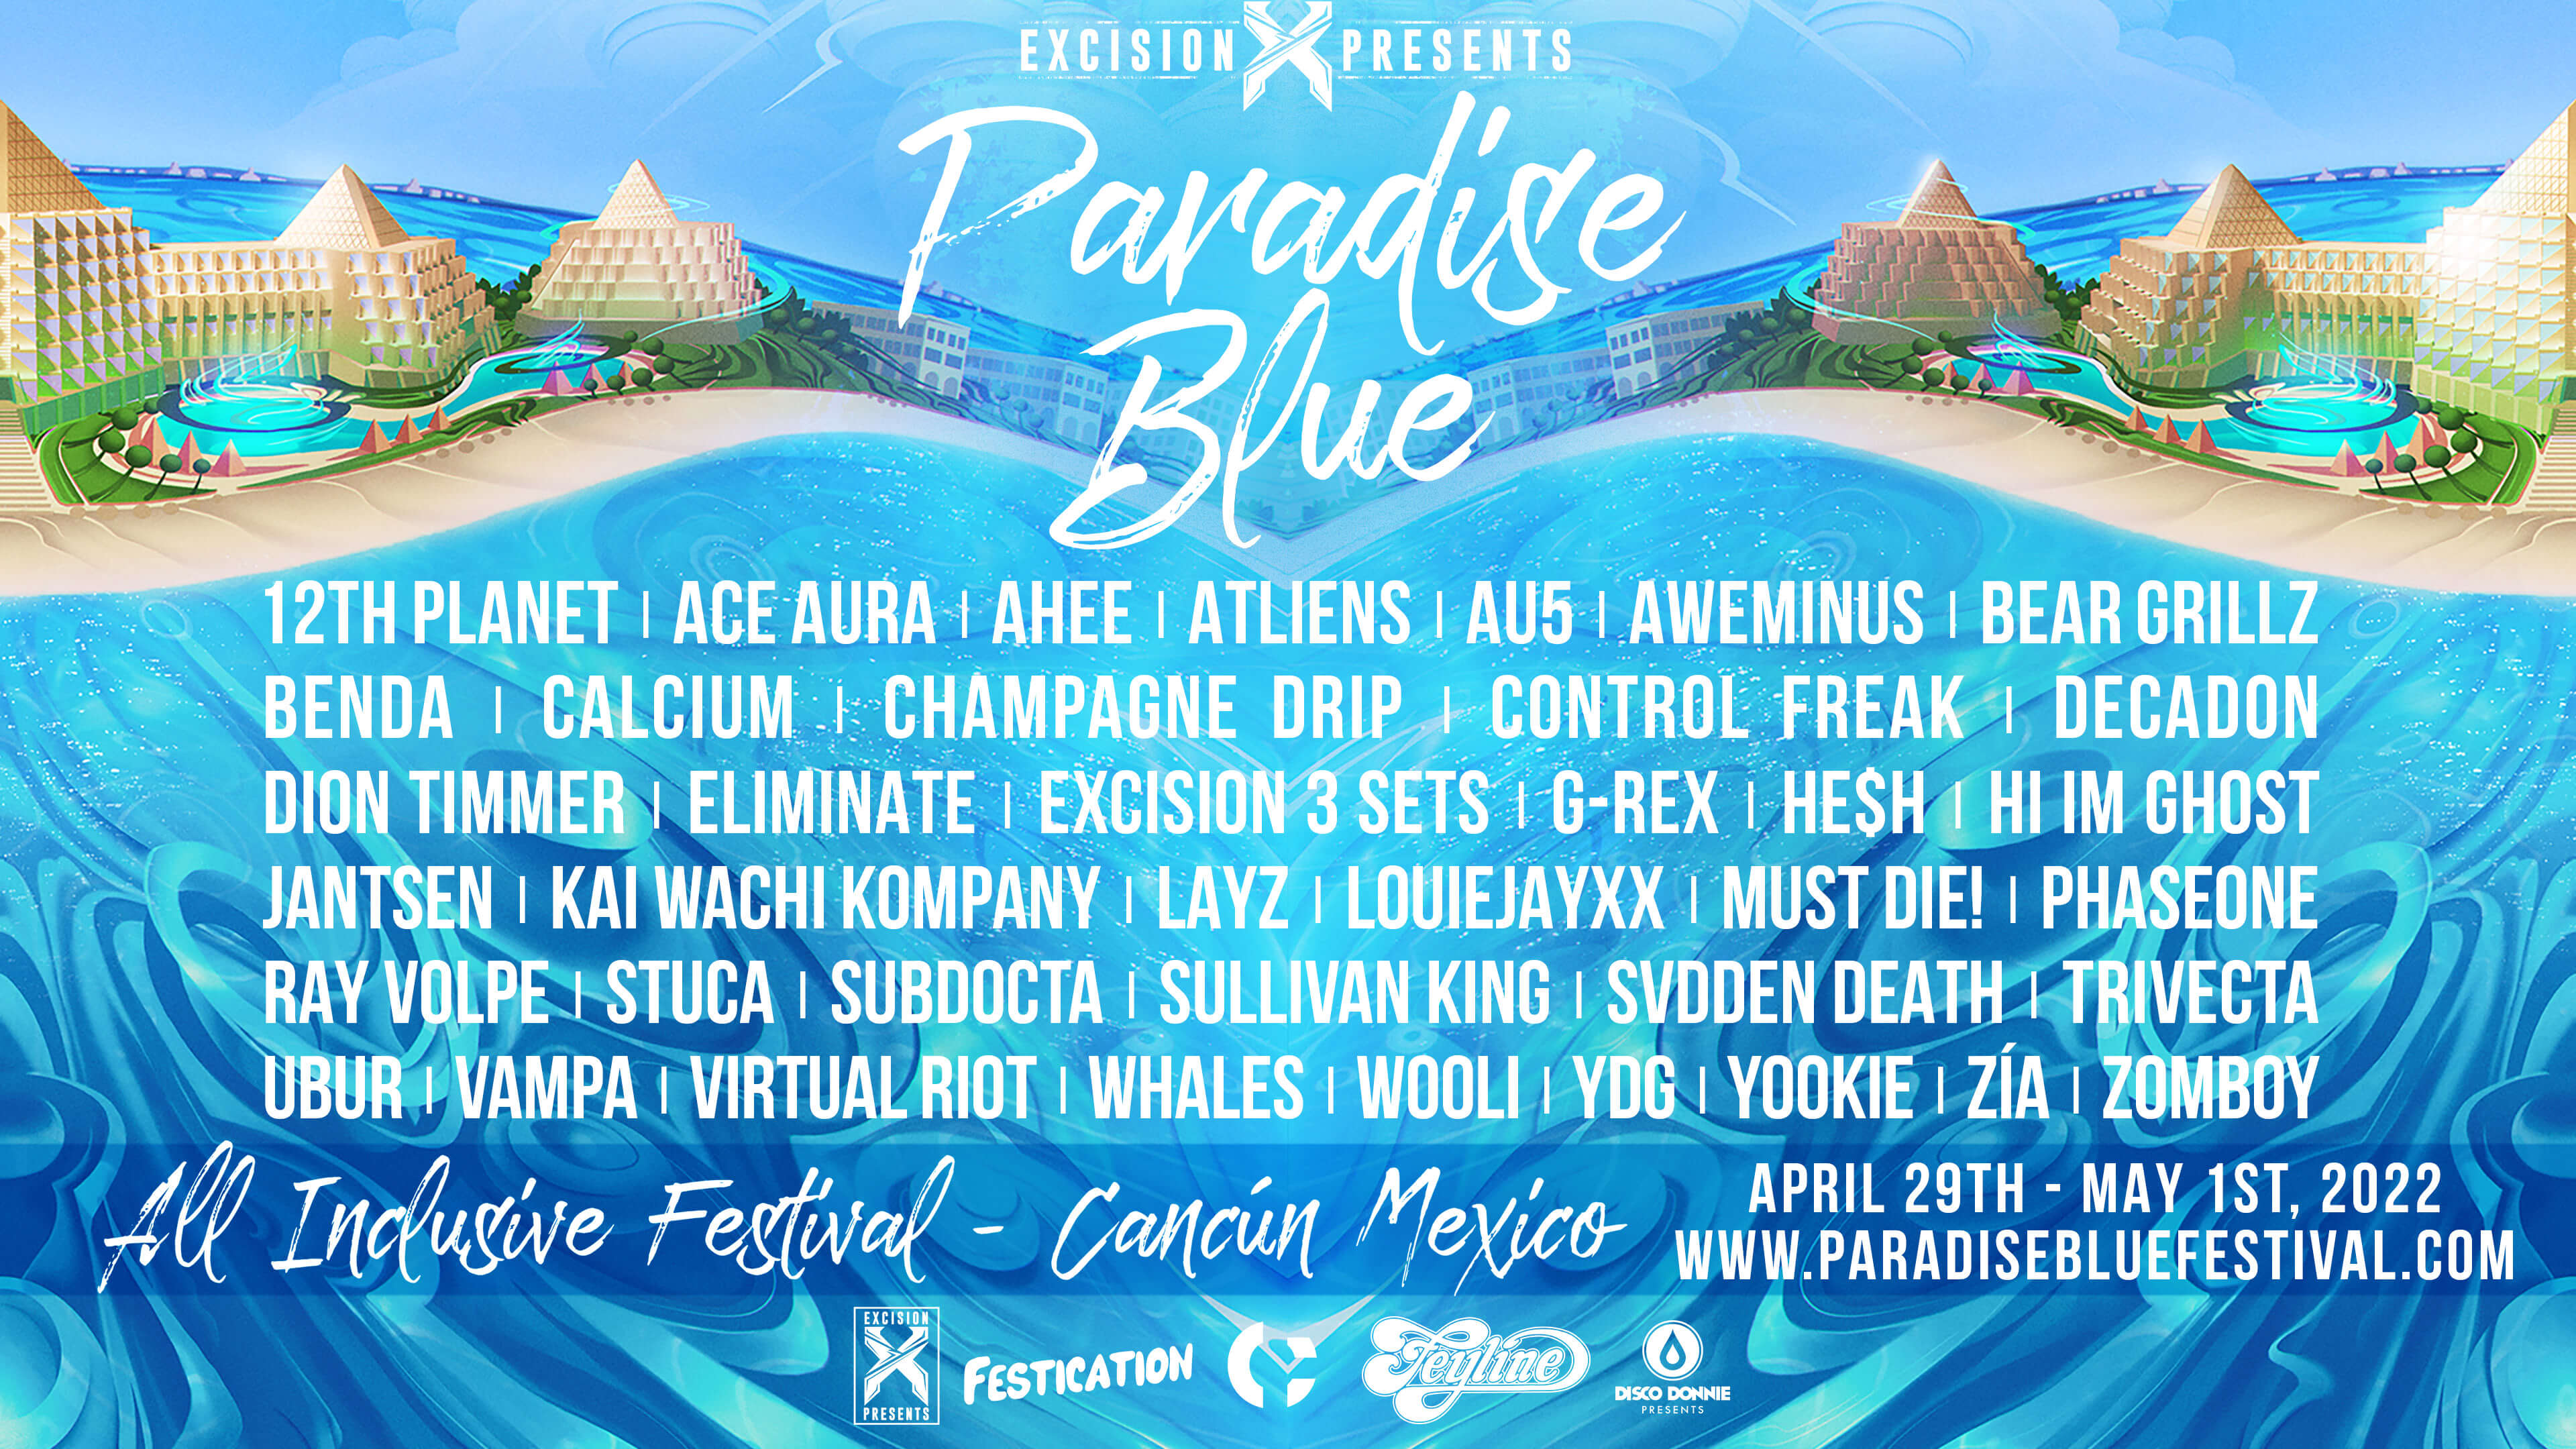 Paradise Blue Festival